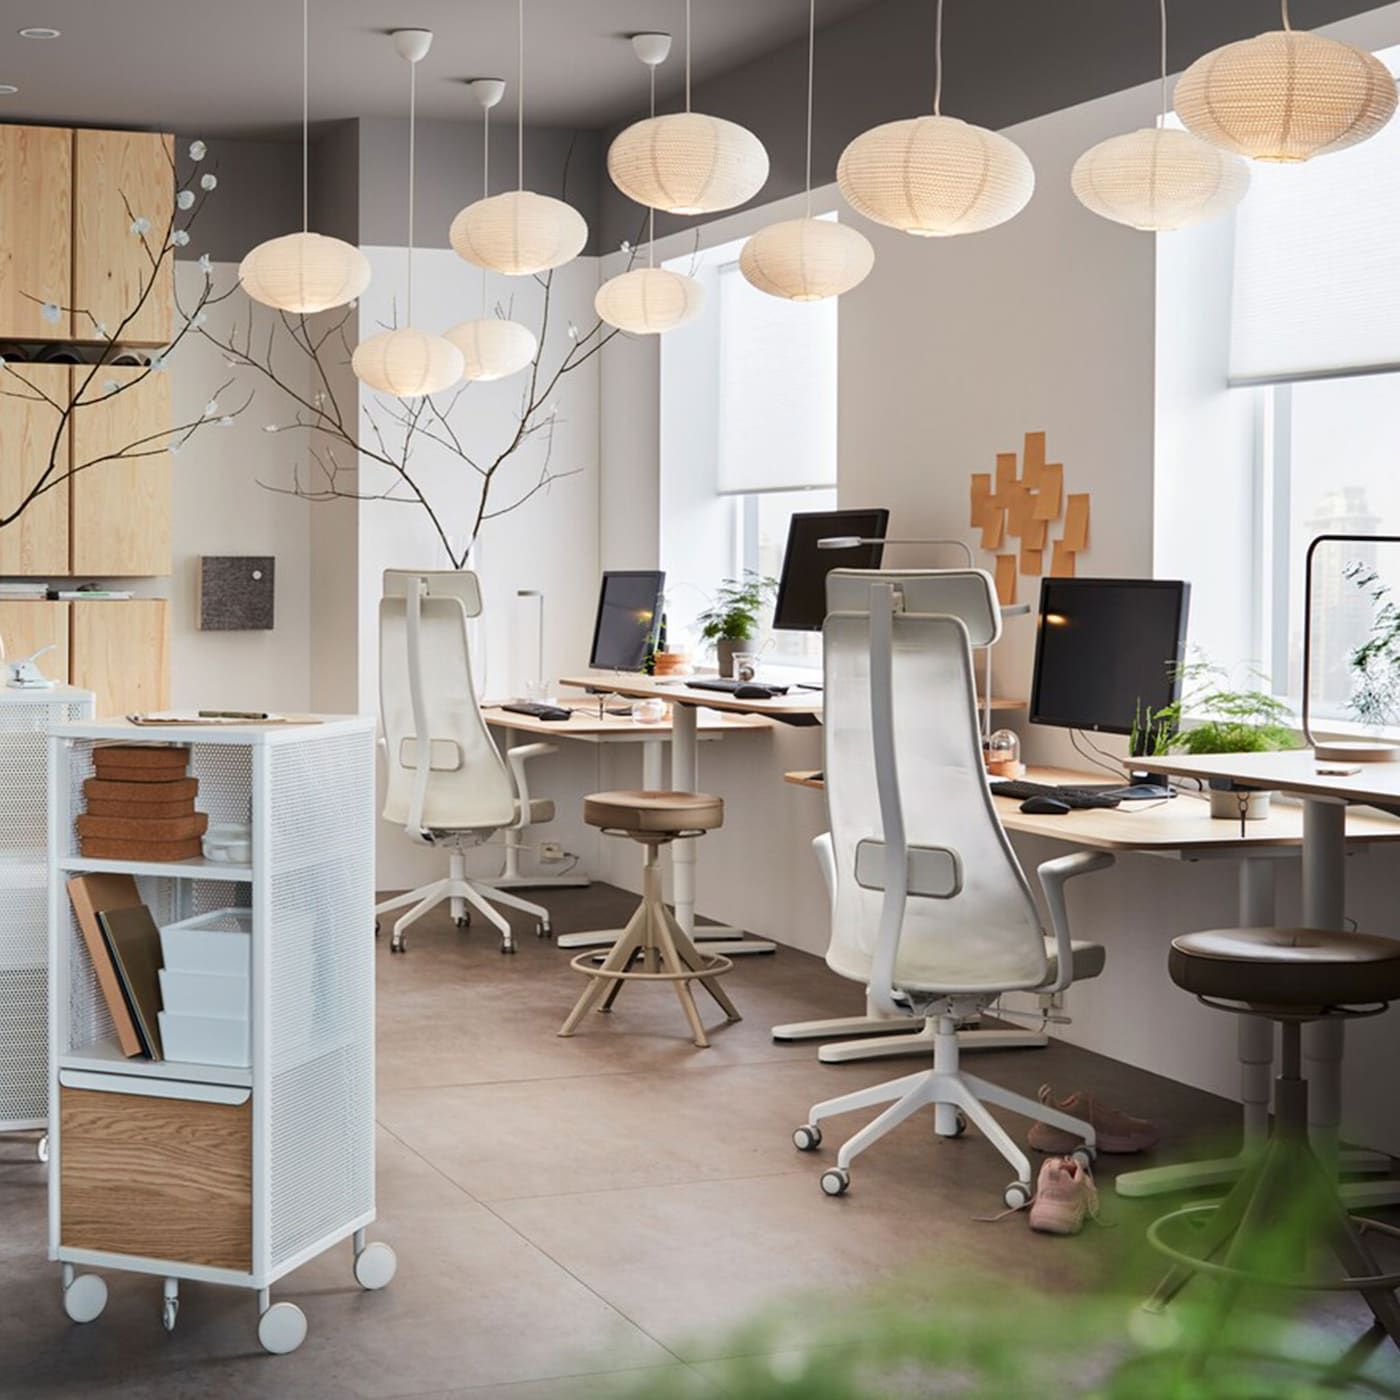 An office furnished with ergonomic IKEA JÄRVFJÄLLET swivel chairs, IVAR pine storage cabinets and BEKANT oak veneer work desks.